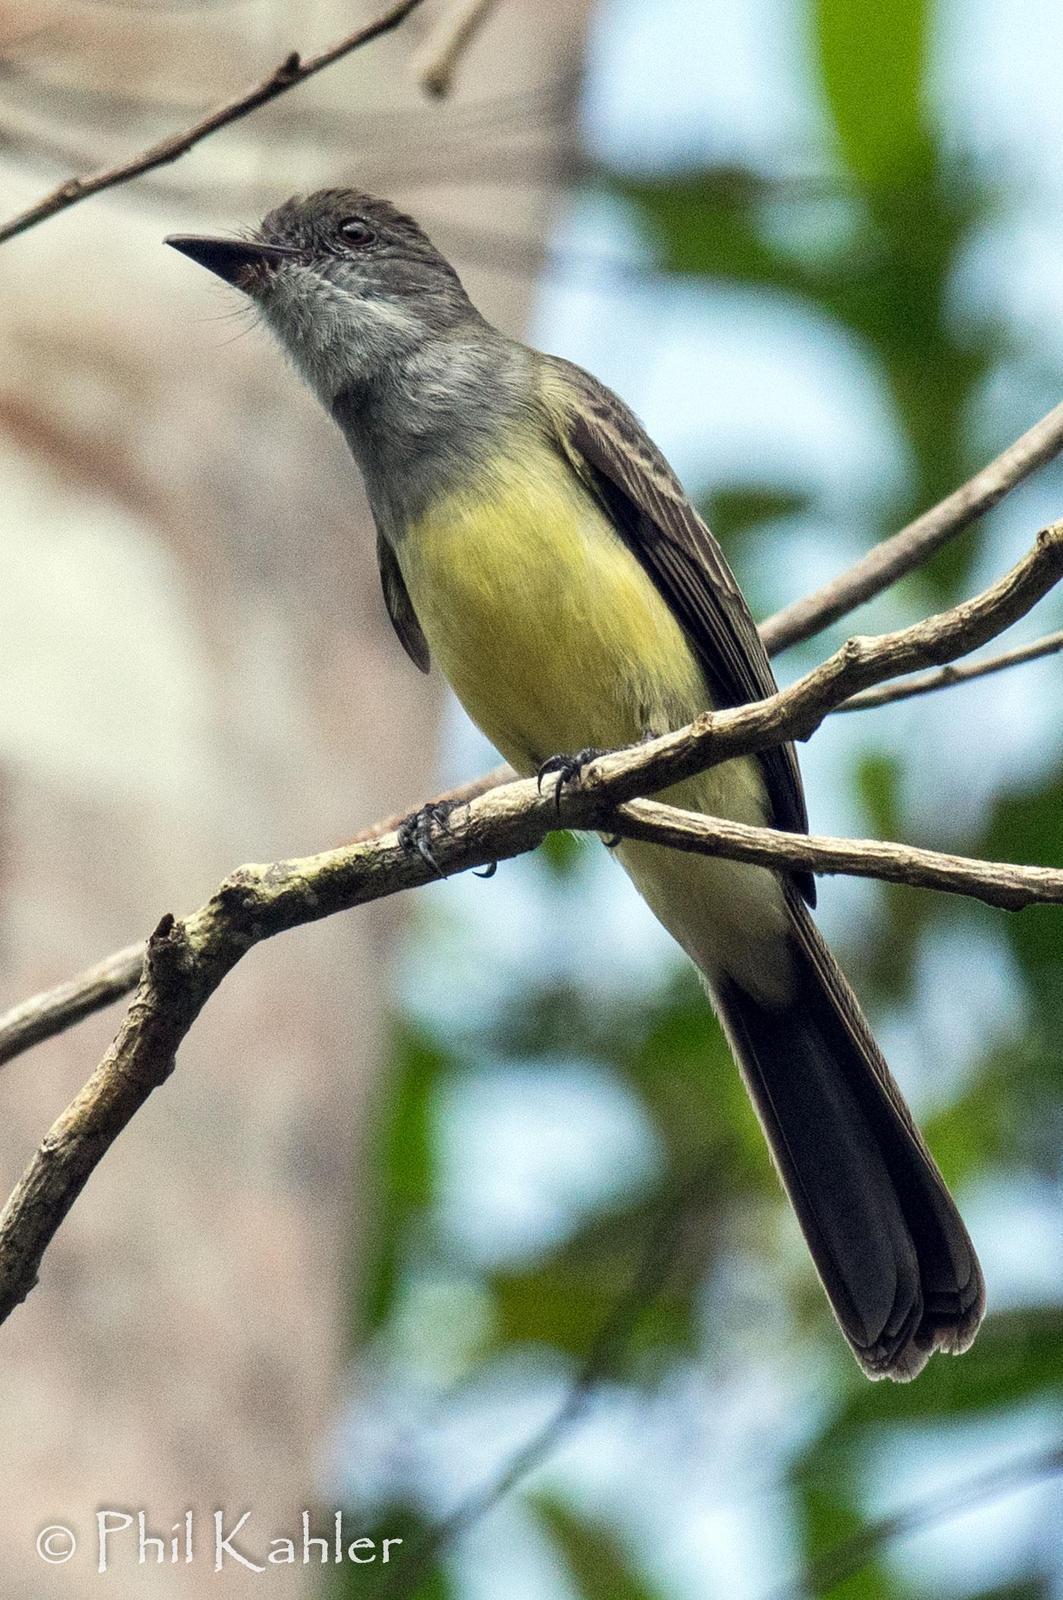 Short-crested Flycatcher Photo by Phil Kahler